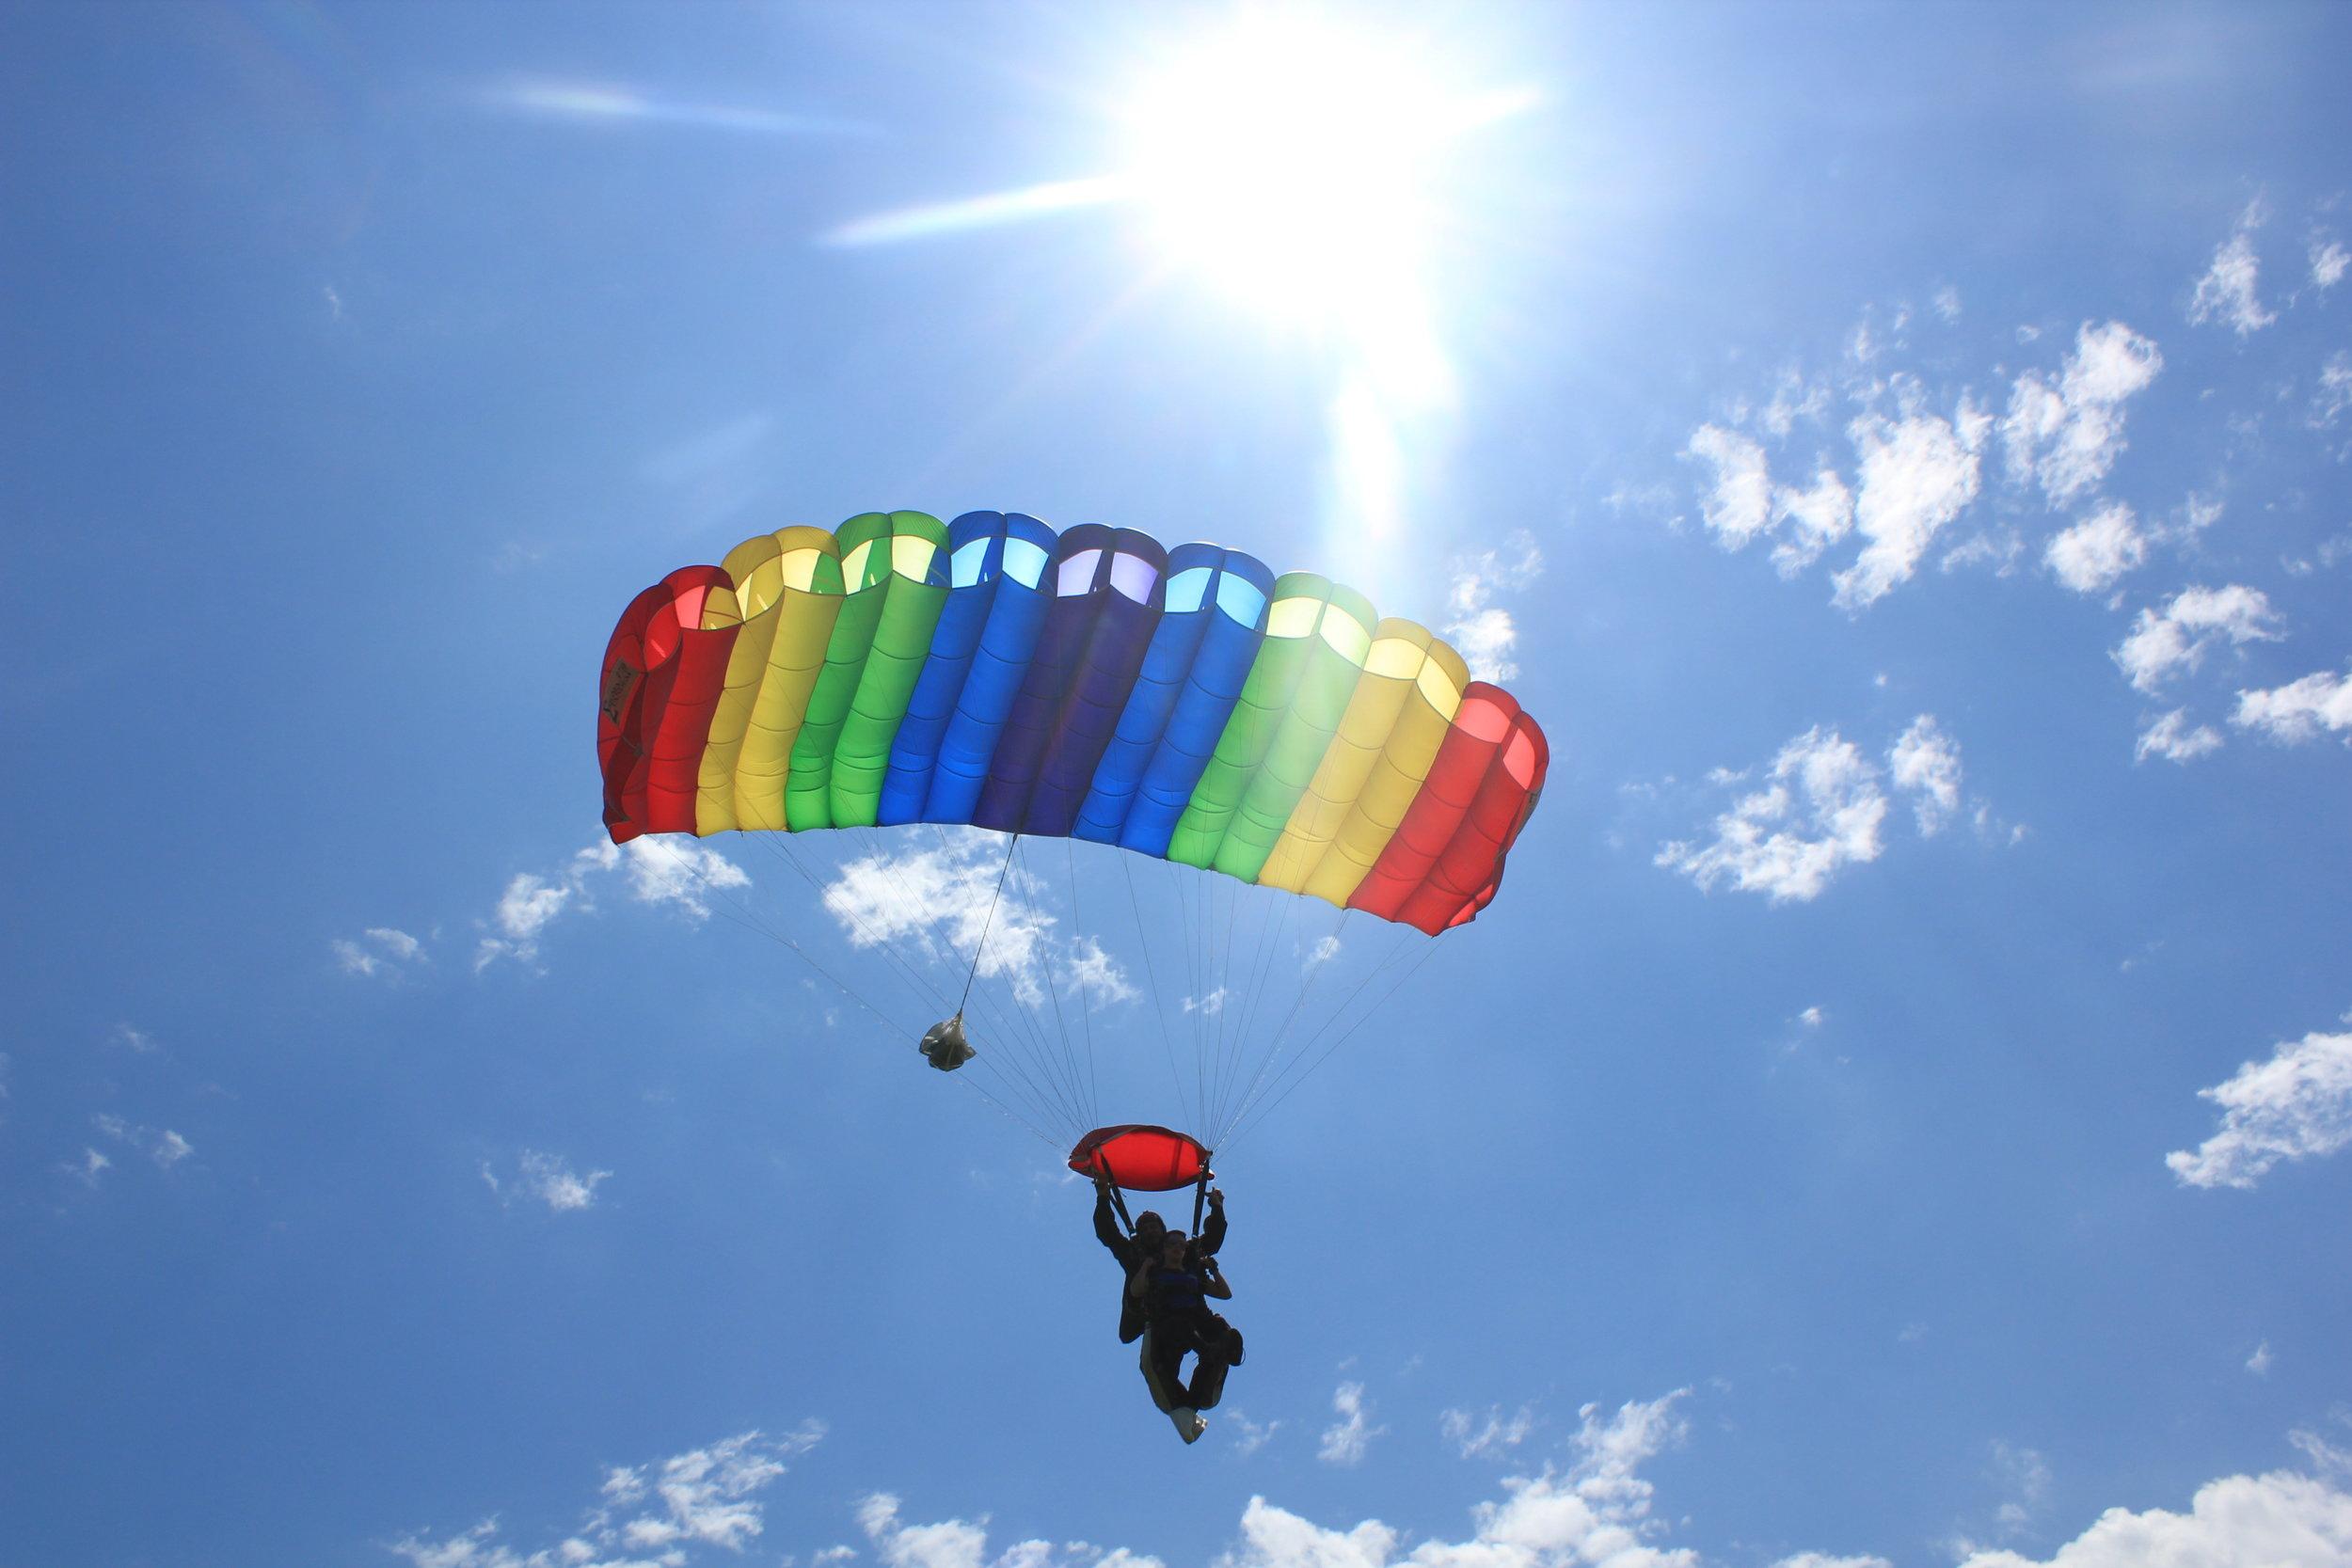 Tandem skydiving at Skydive Cross Keys 2017